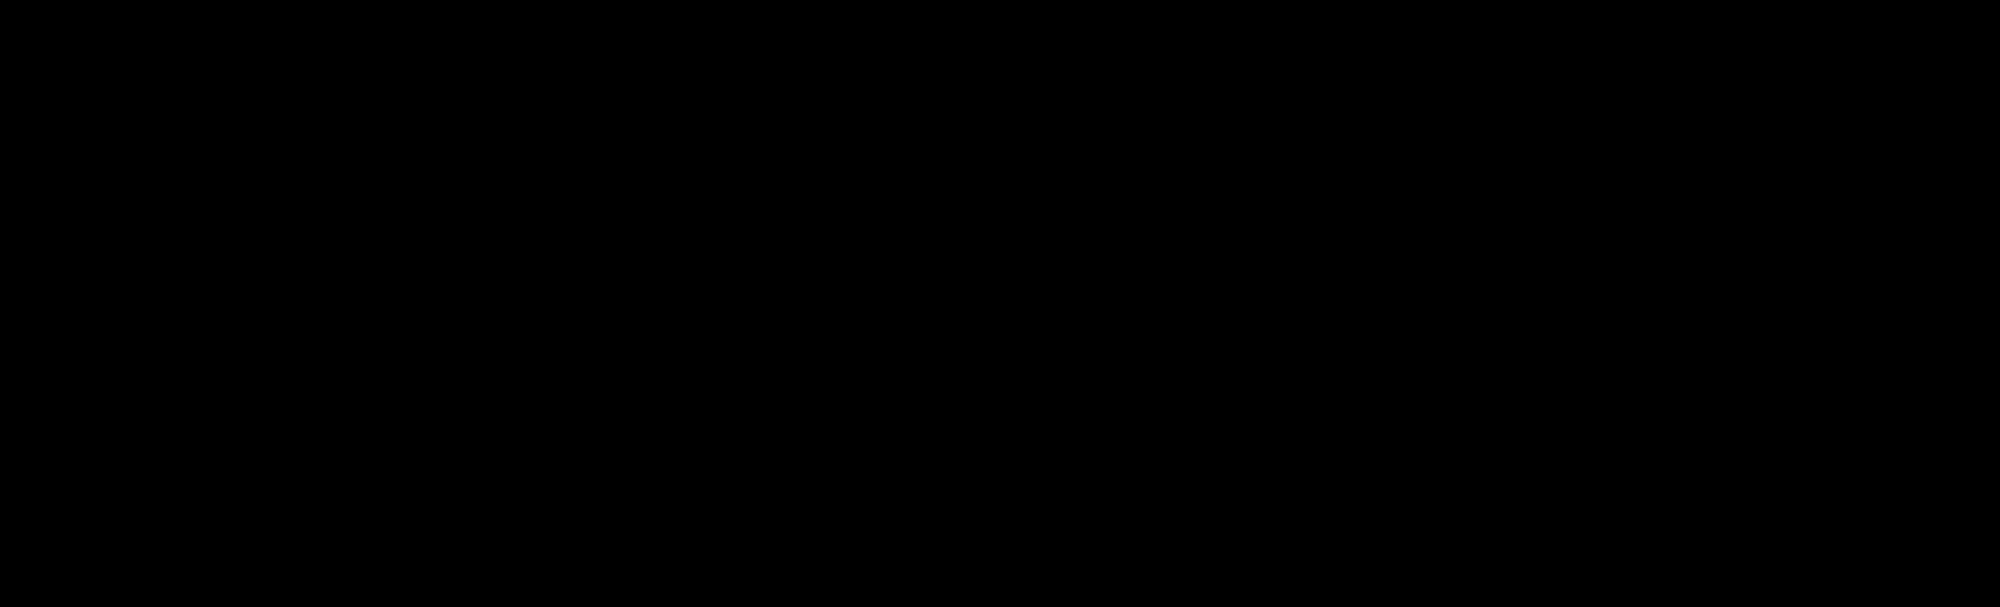 Logo Arch Enemy PNG - 28439